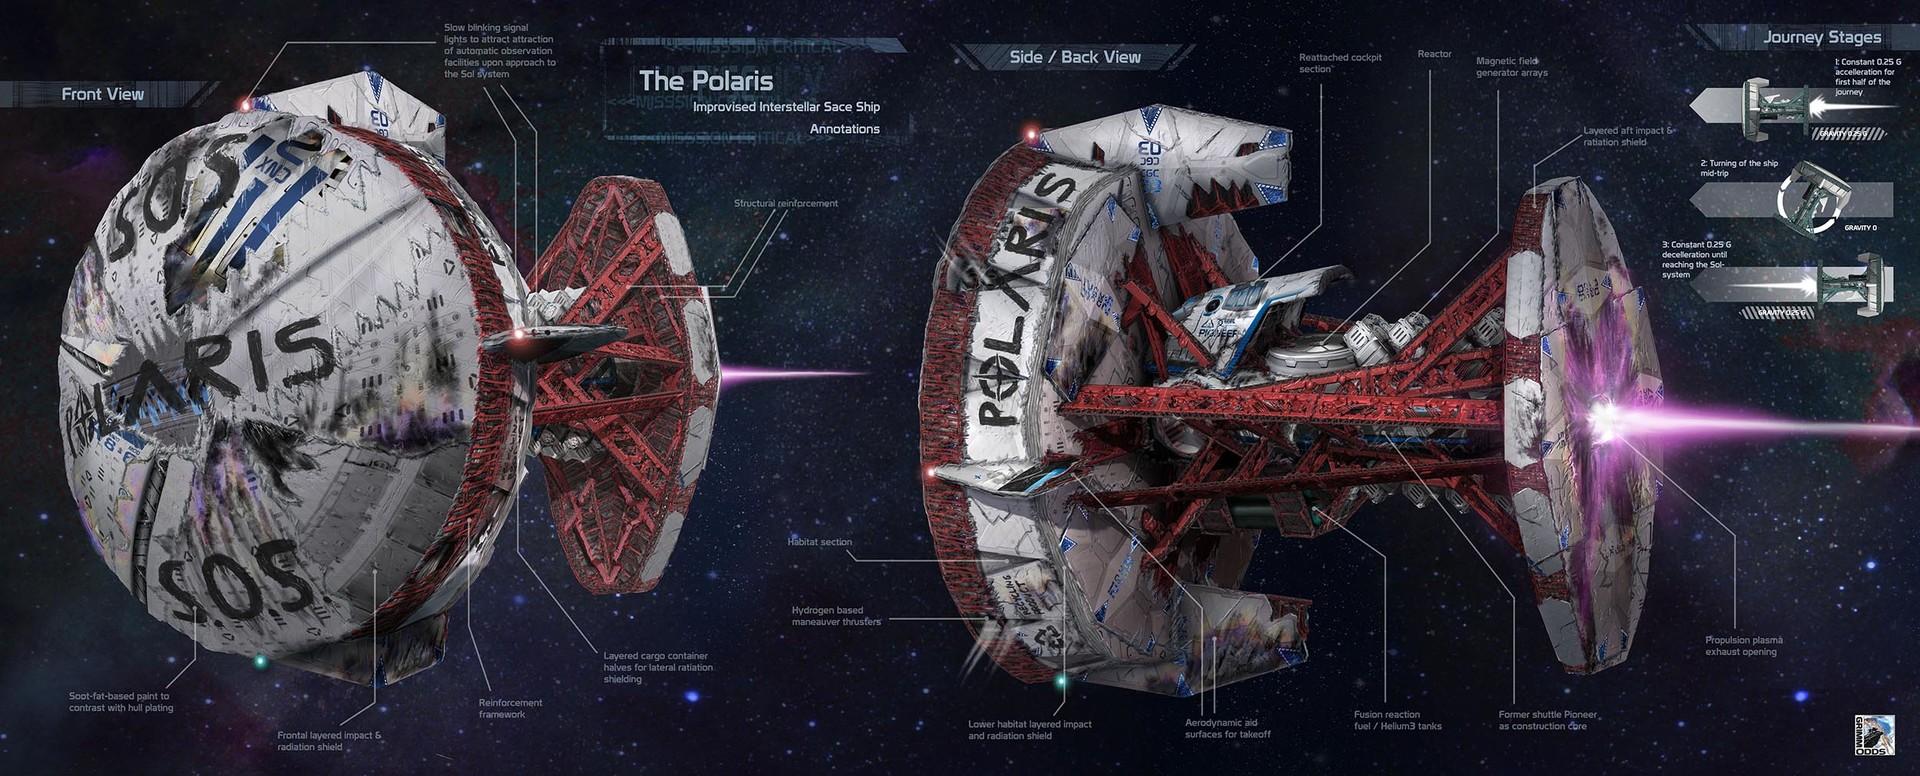 Grimm Odds - Improvised Junk Escape Spaceship